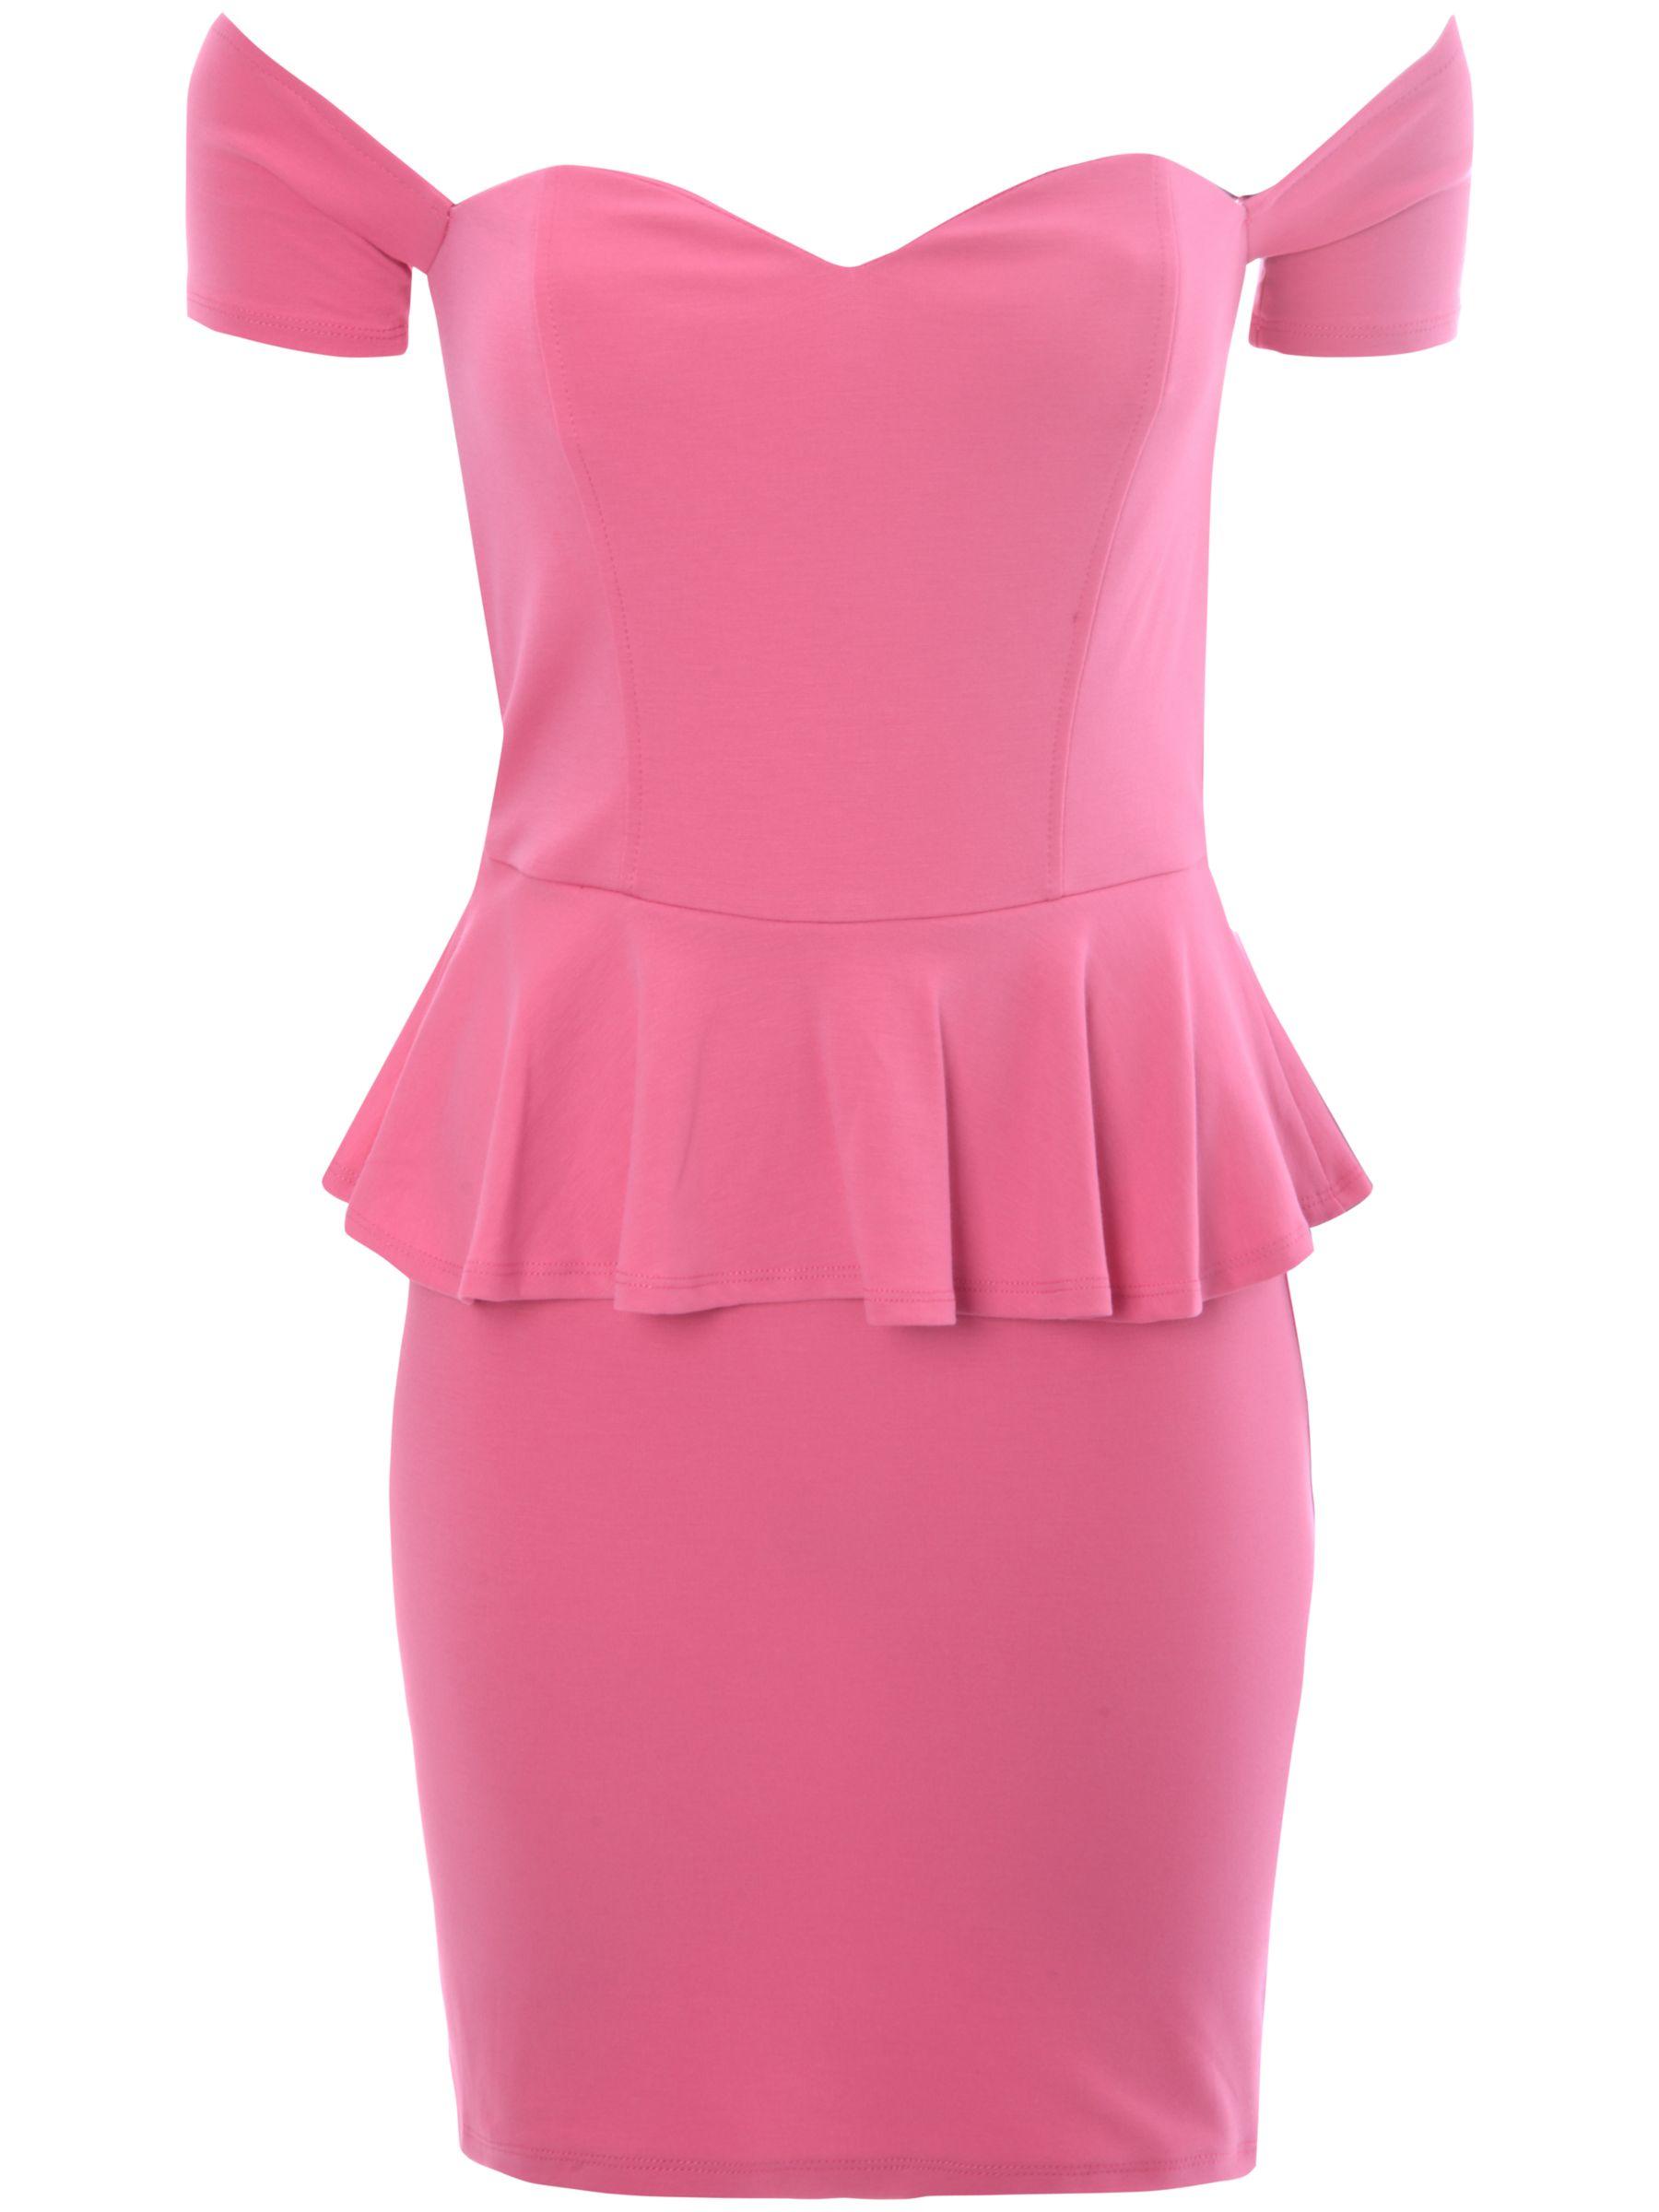 true decadence bardot peplum dress pink, true, decadence, bardot, peplum, dress, pink, true decadence, 10 18 14 16 12 8, clearance, womenswear offers, womens dresses offers, women, womens dresses, special offers, 1587334